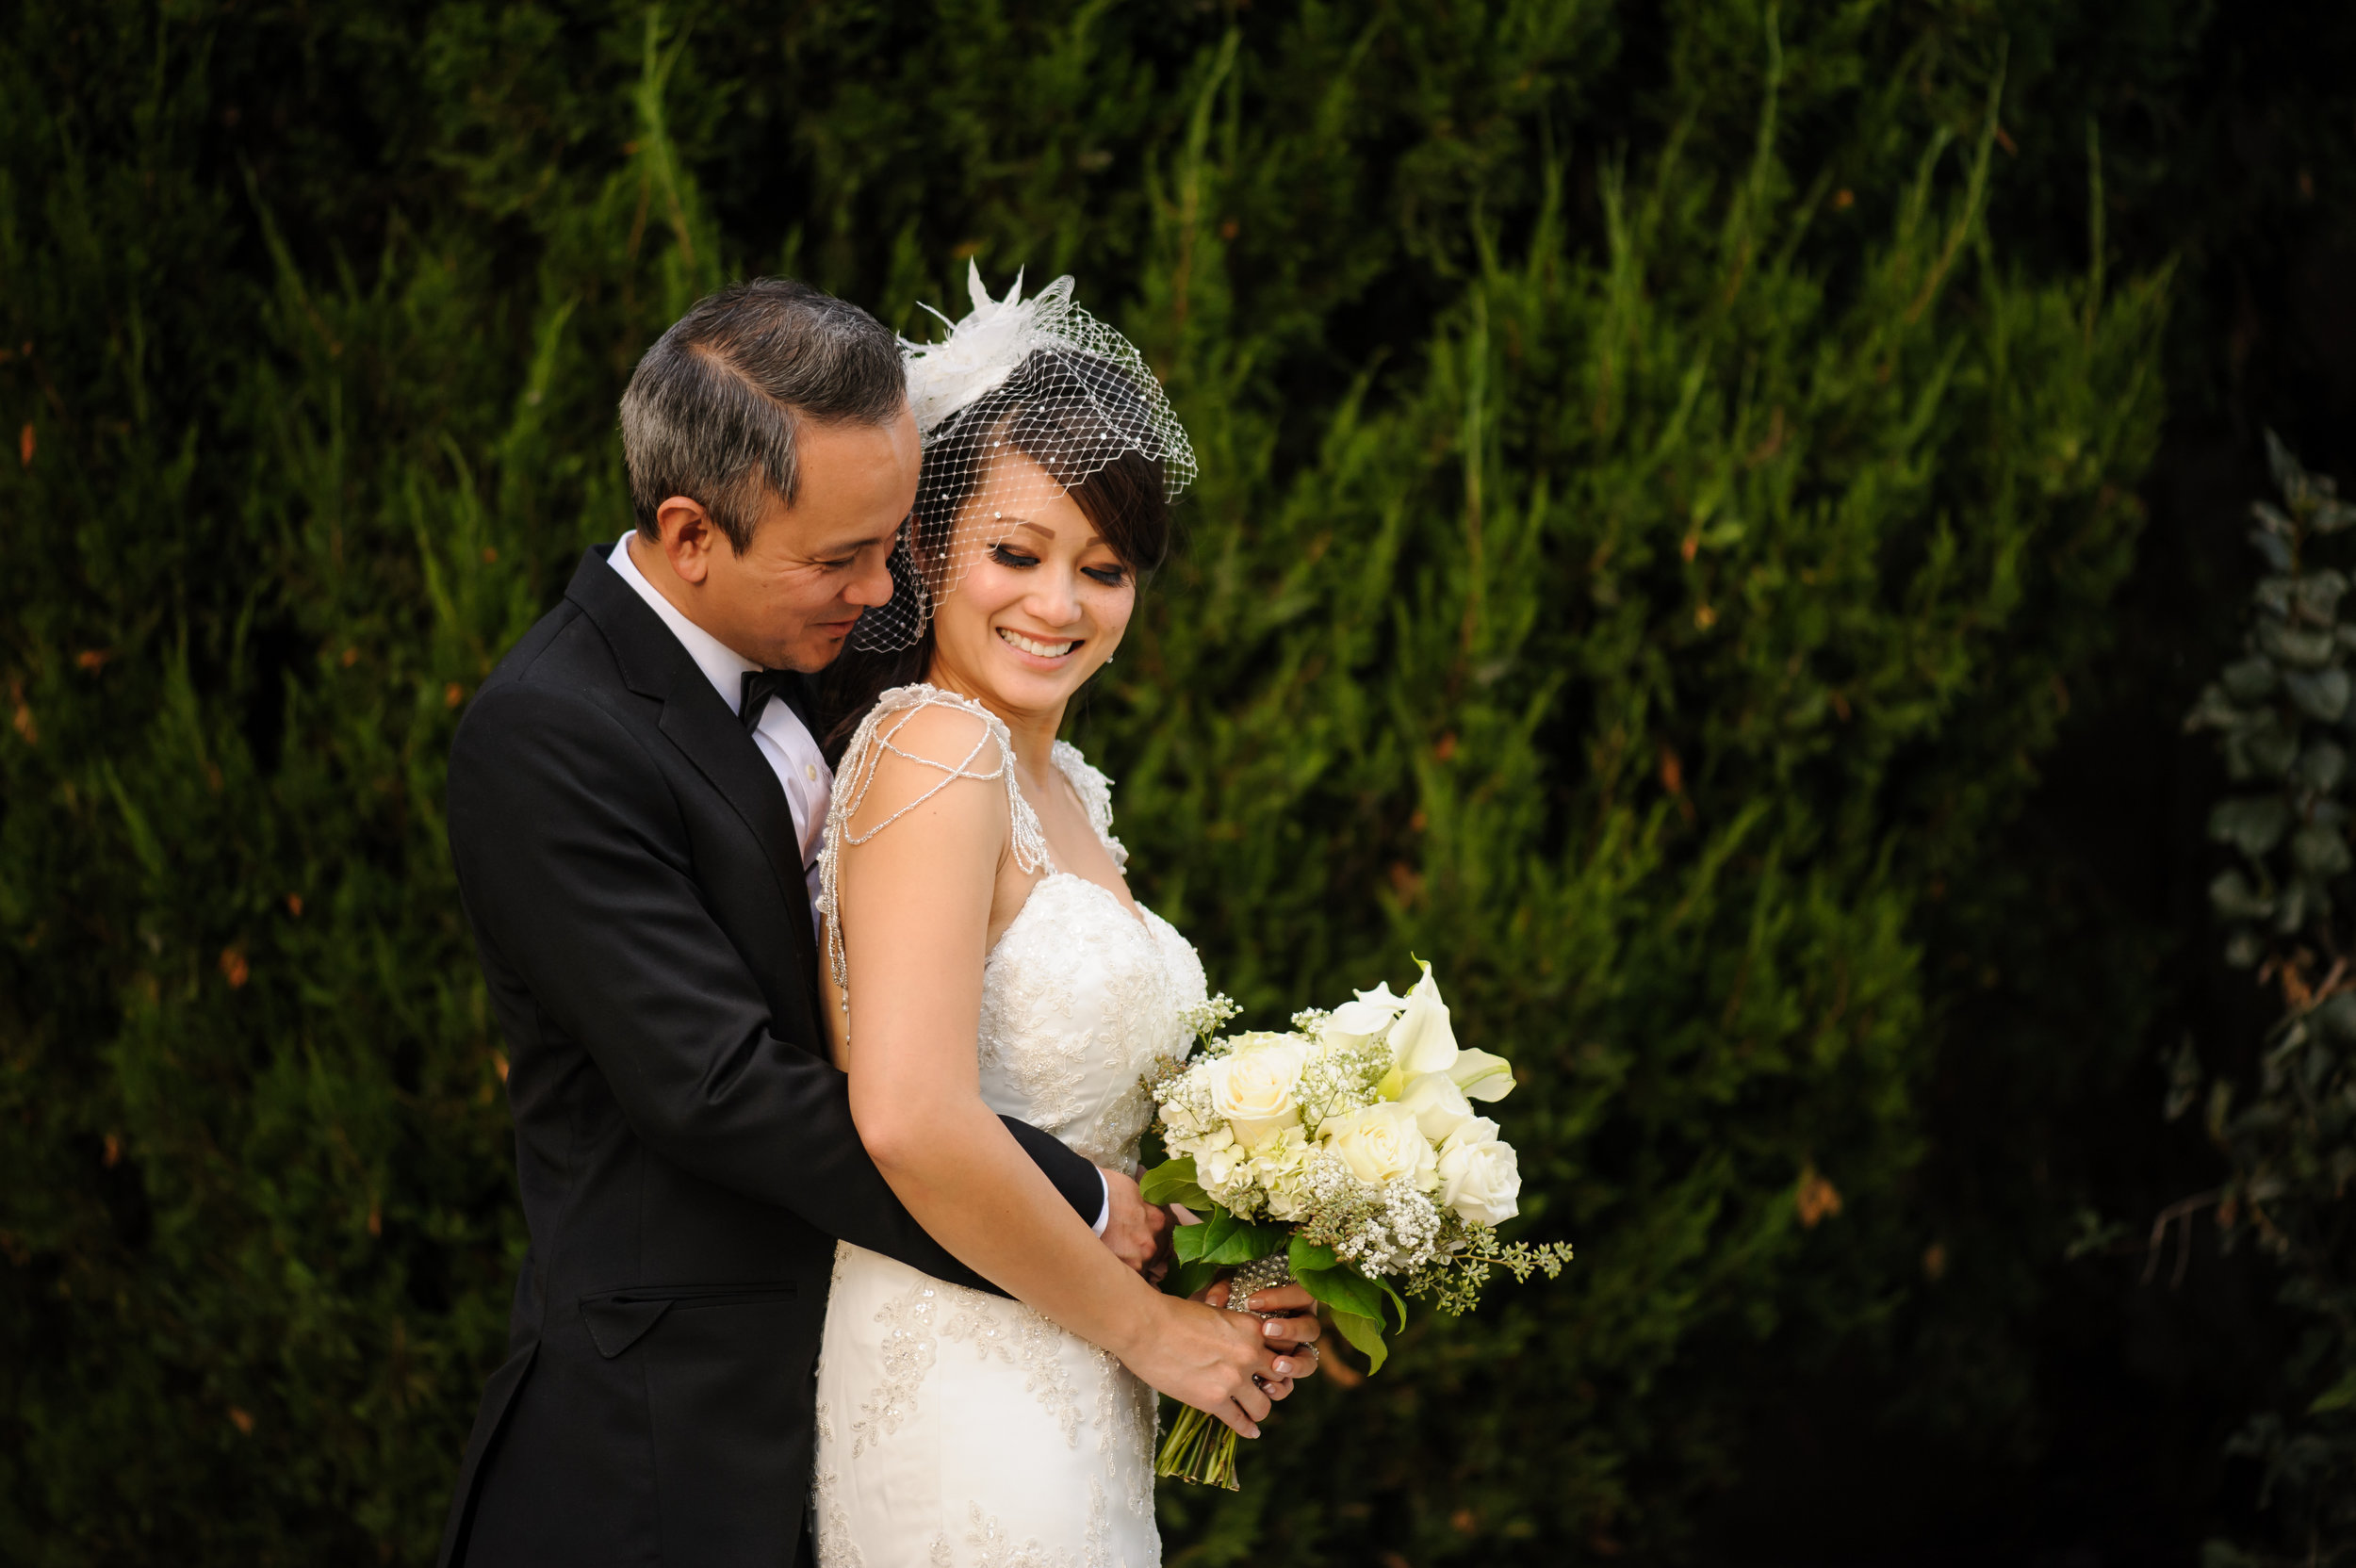 camilla-thuy-074-memorial-auditorium-sacramento-wedding-photographer-katherine-nicole-photography.JPG